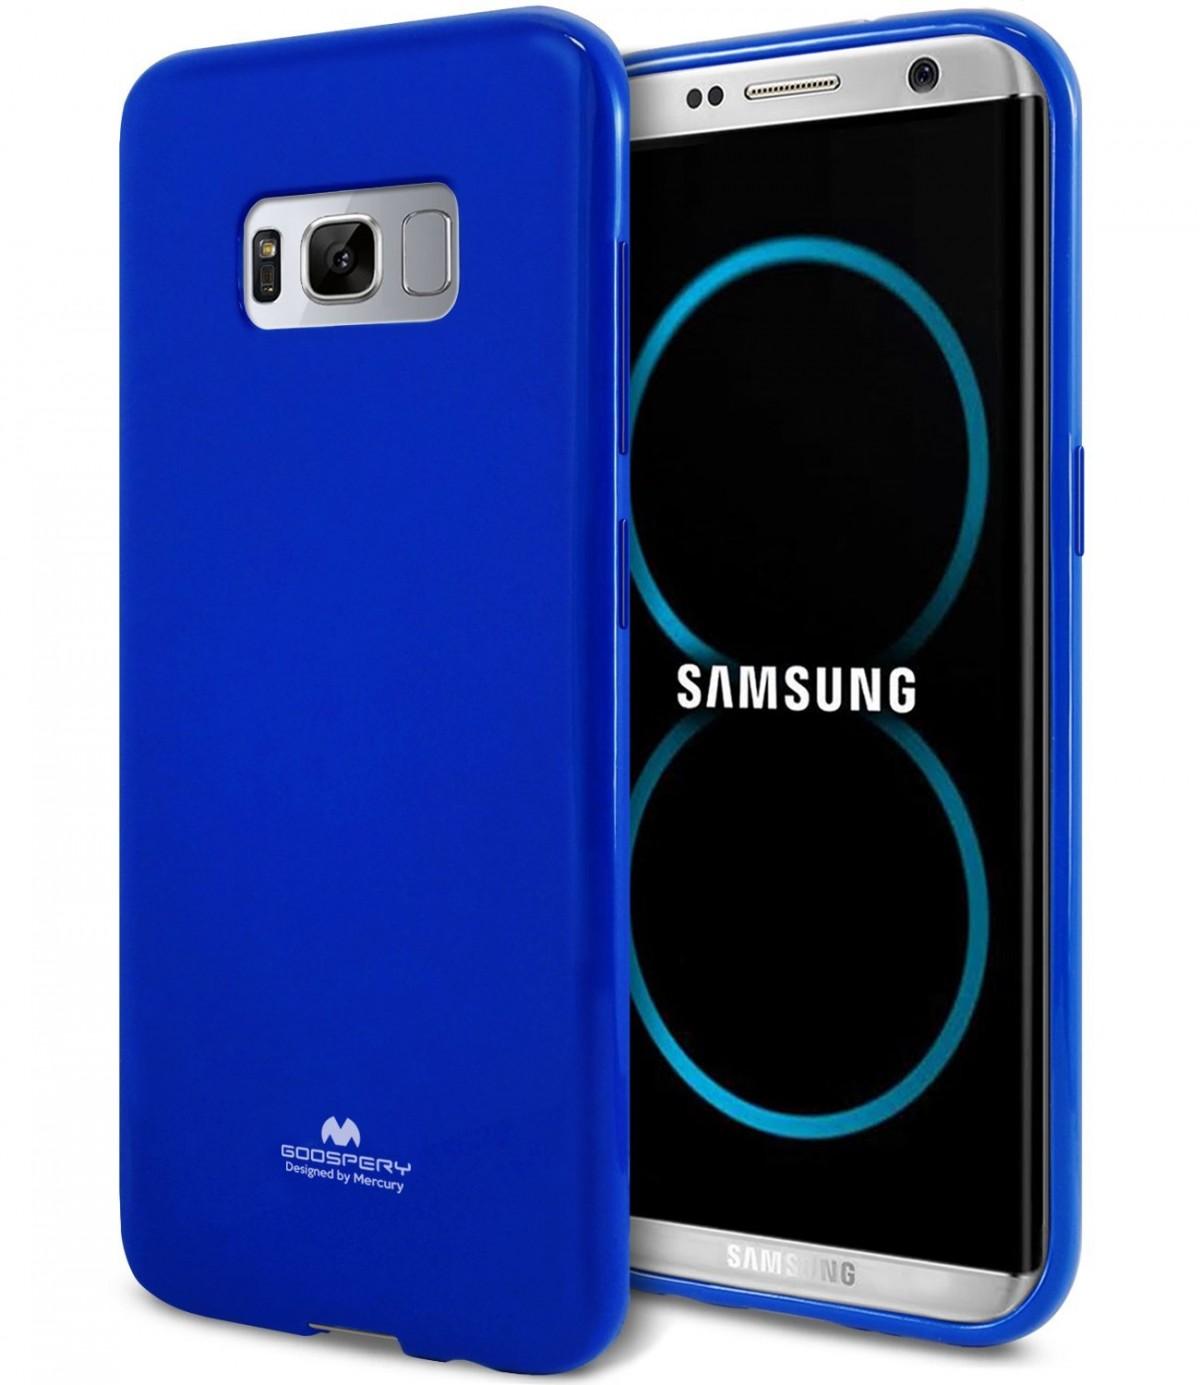 Silikonový obal / kryt / pouzdro Goospery Mercury pro Samsung Galaxy S8+ (S8 Plus) - Jelly Case - Modrý